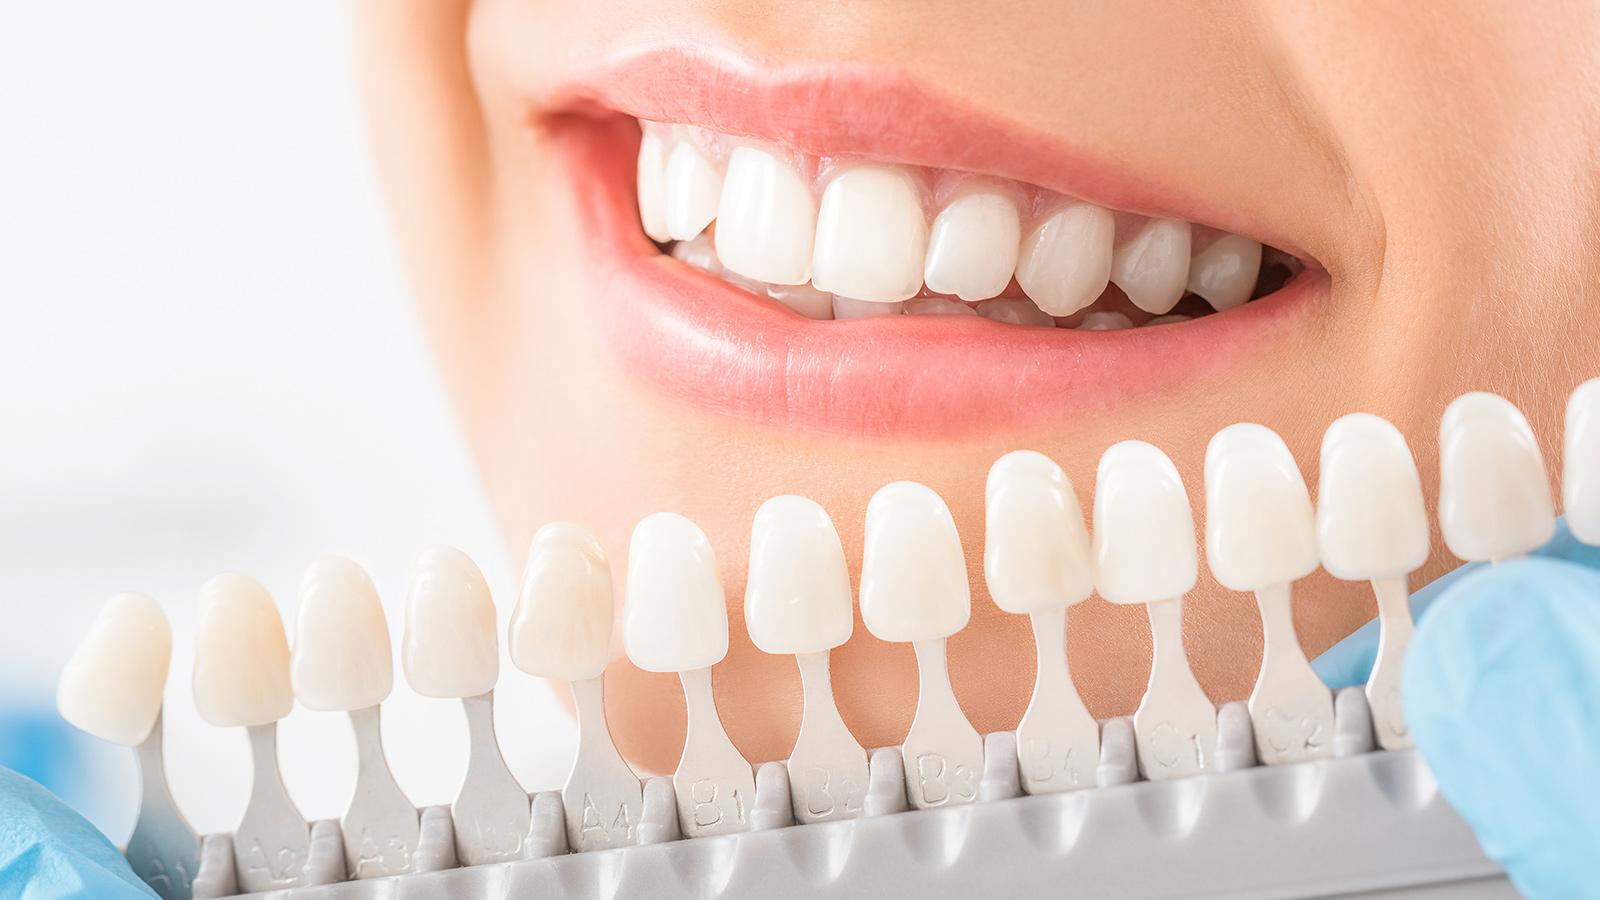 Professional Teeth Whitening Process & Results | Gregg M. Festa, DDSGregg M. Festa, DDS